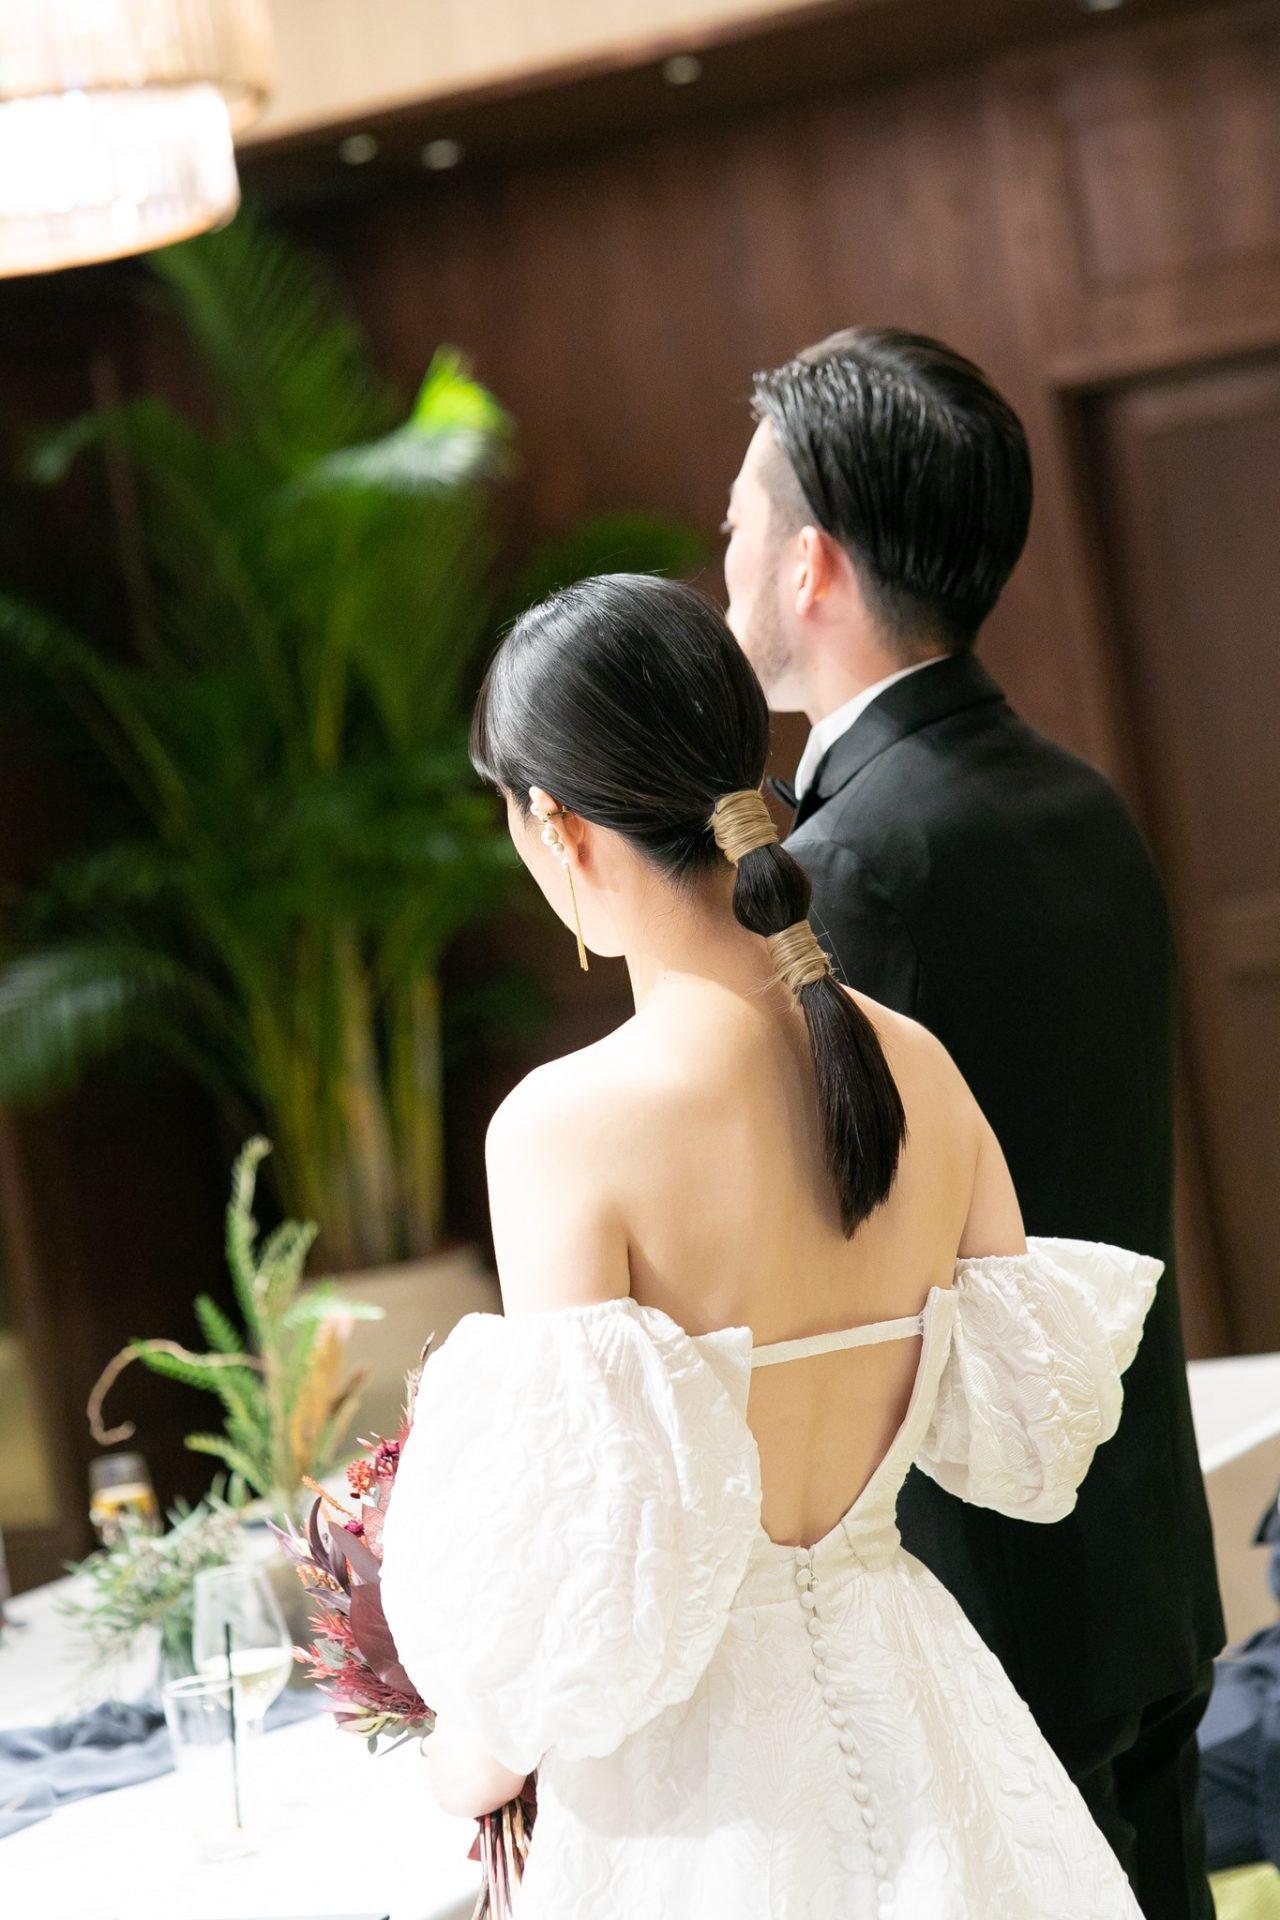 THE TREAT DRESSING名古屋店で家族式や少人数式におすすめの2WAYのウェディングドレス